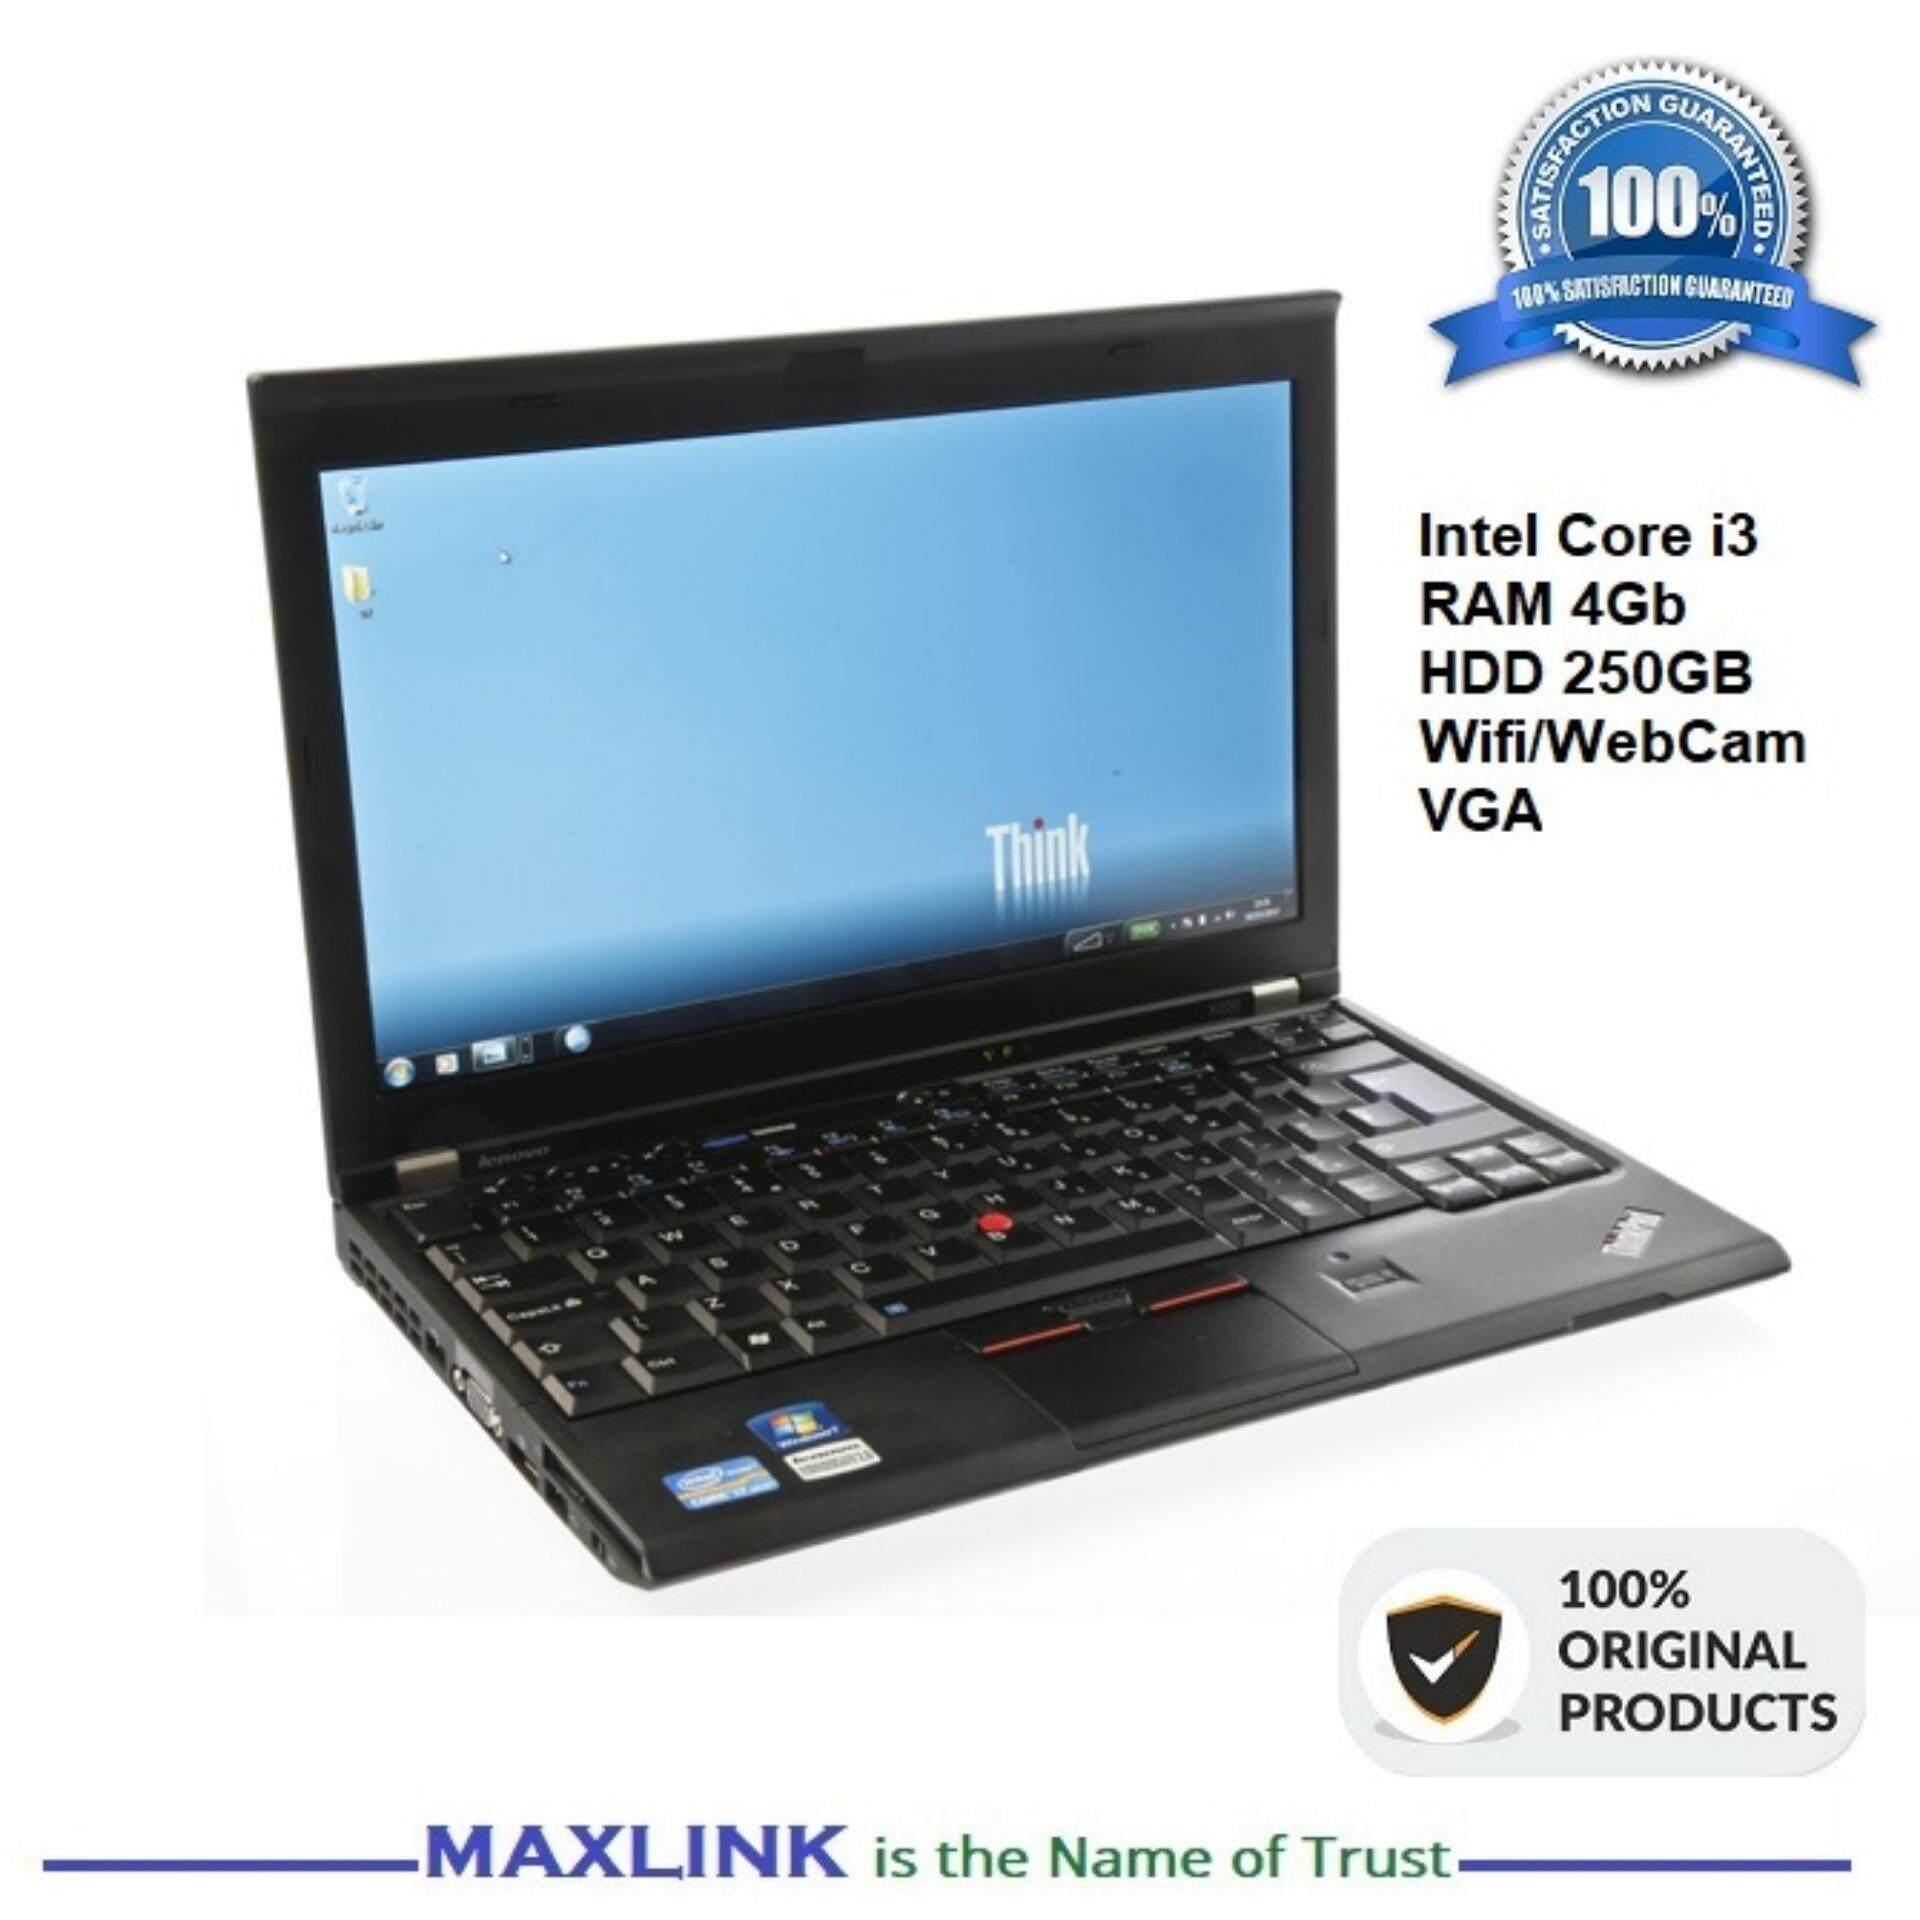 Lenovo ThinkPad X220i Intel Core I3 / 4GB / HDD 250Gb 12.5 low budget heavy duty laptop {REFURBISHED} Malaysia